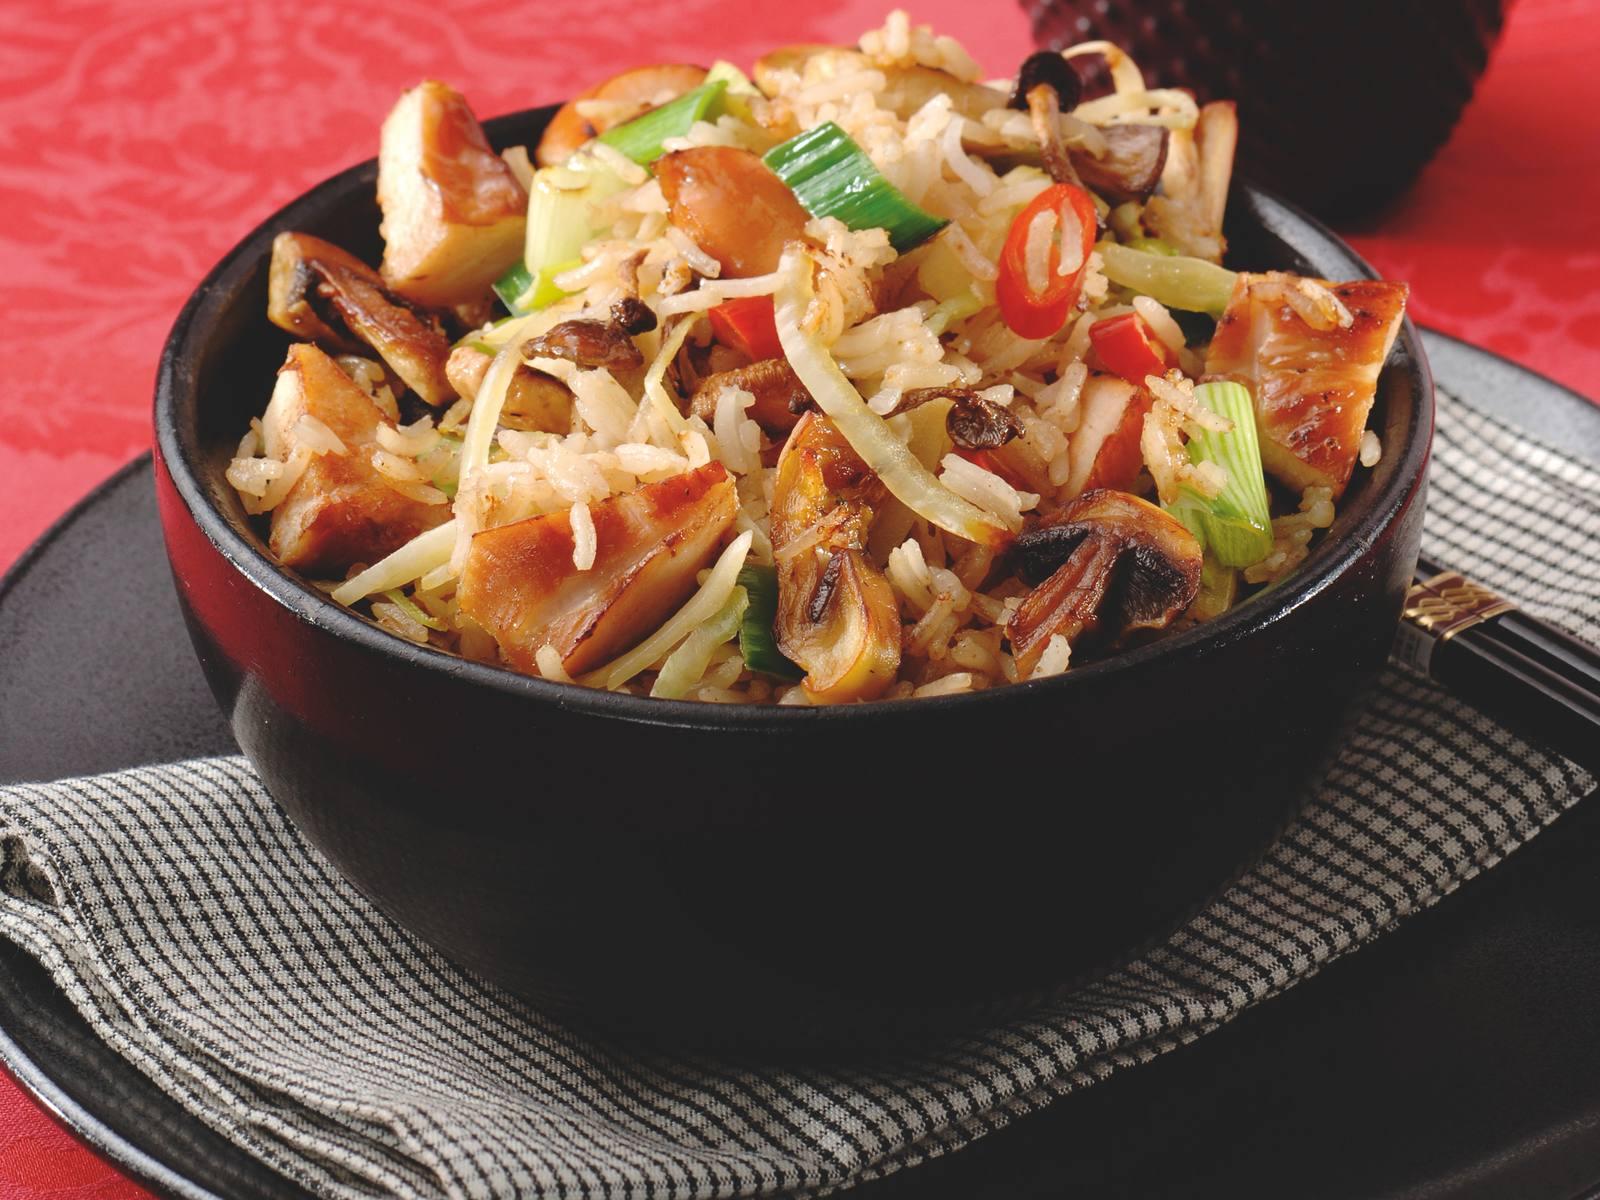 Gewokte Five Spice rijst met gerookte kip en paddenstoelen